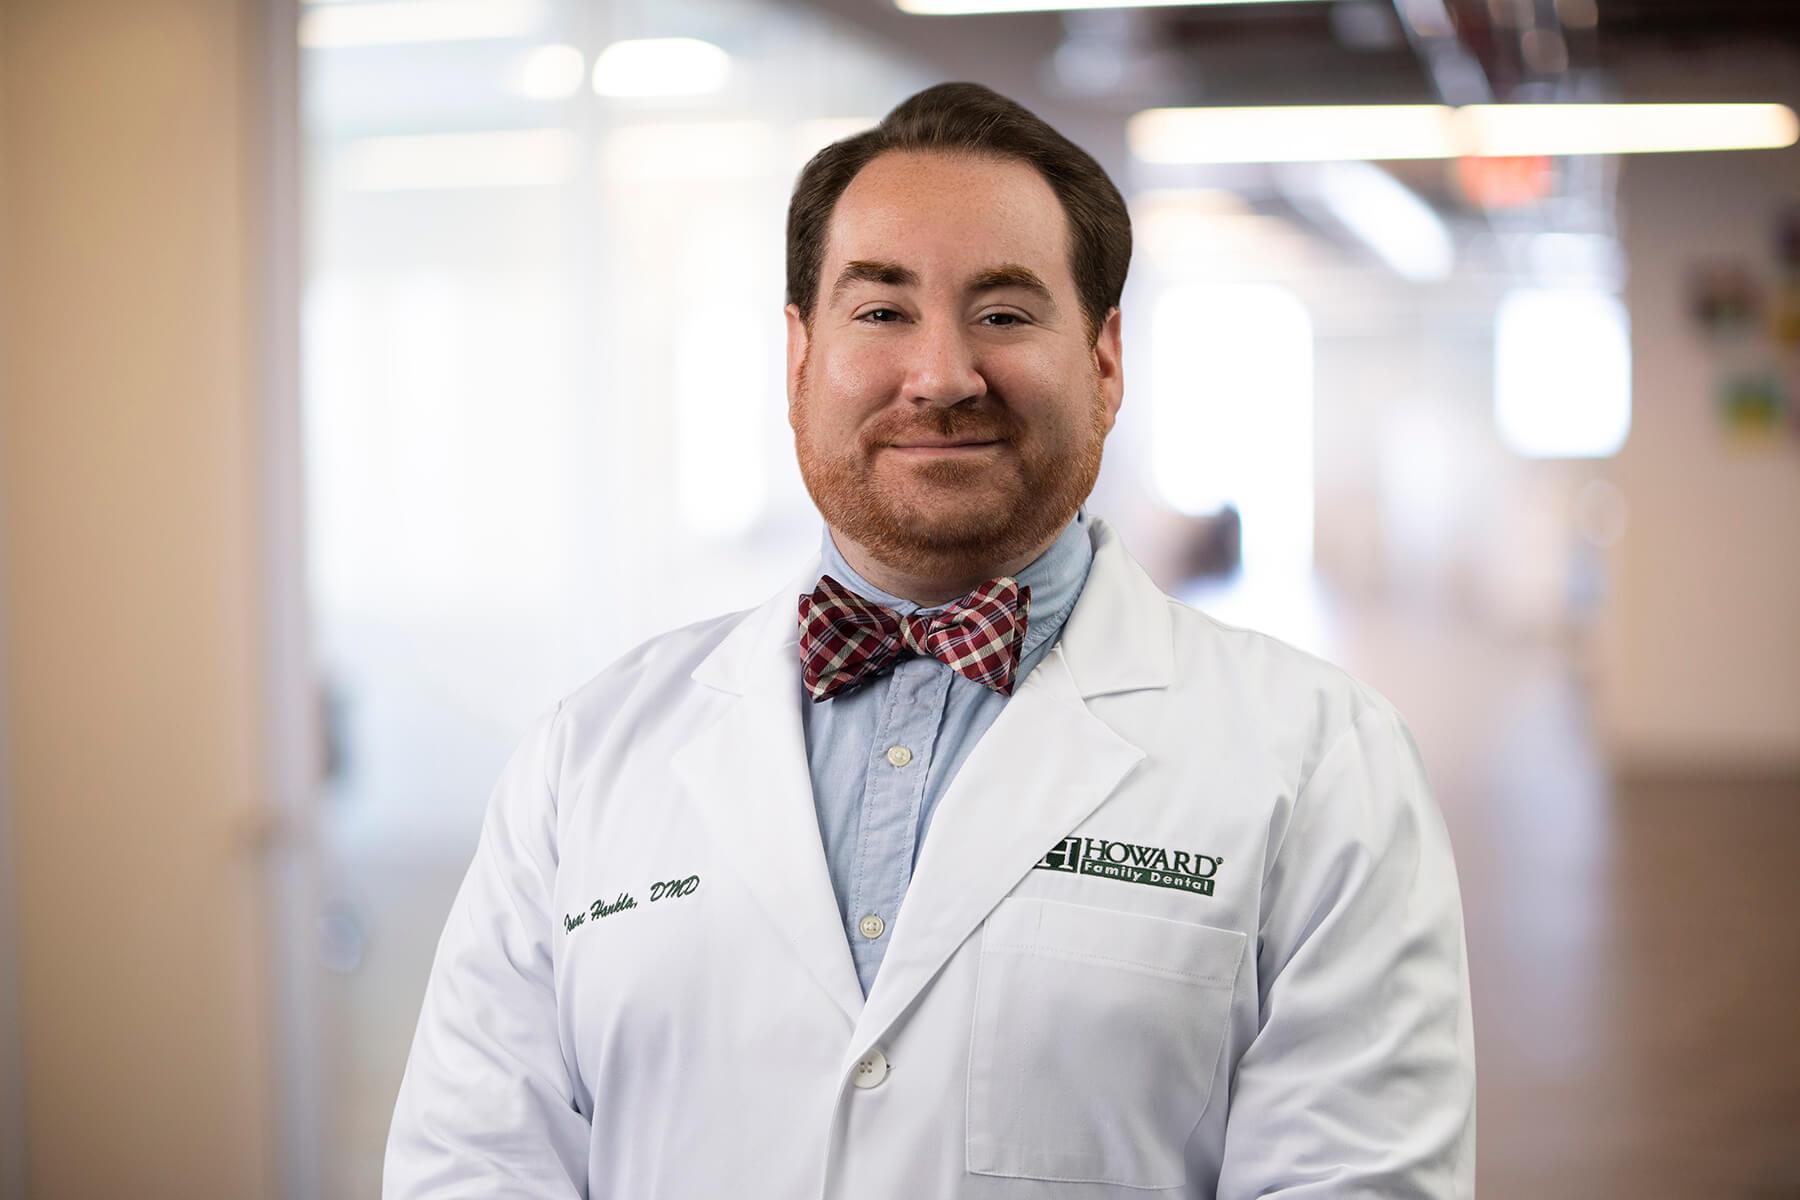 Dr. Isaac Hankla